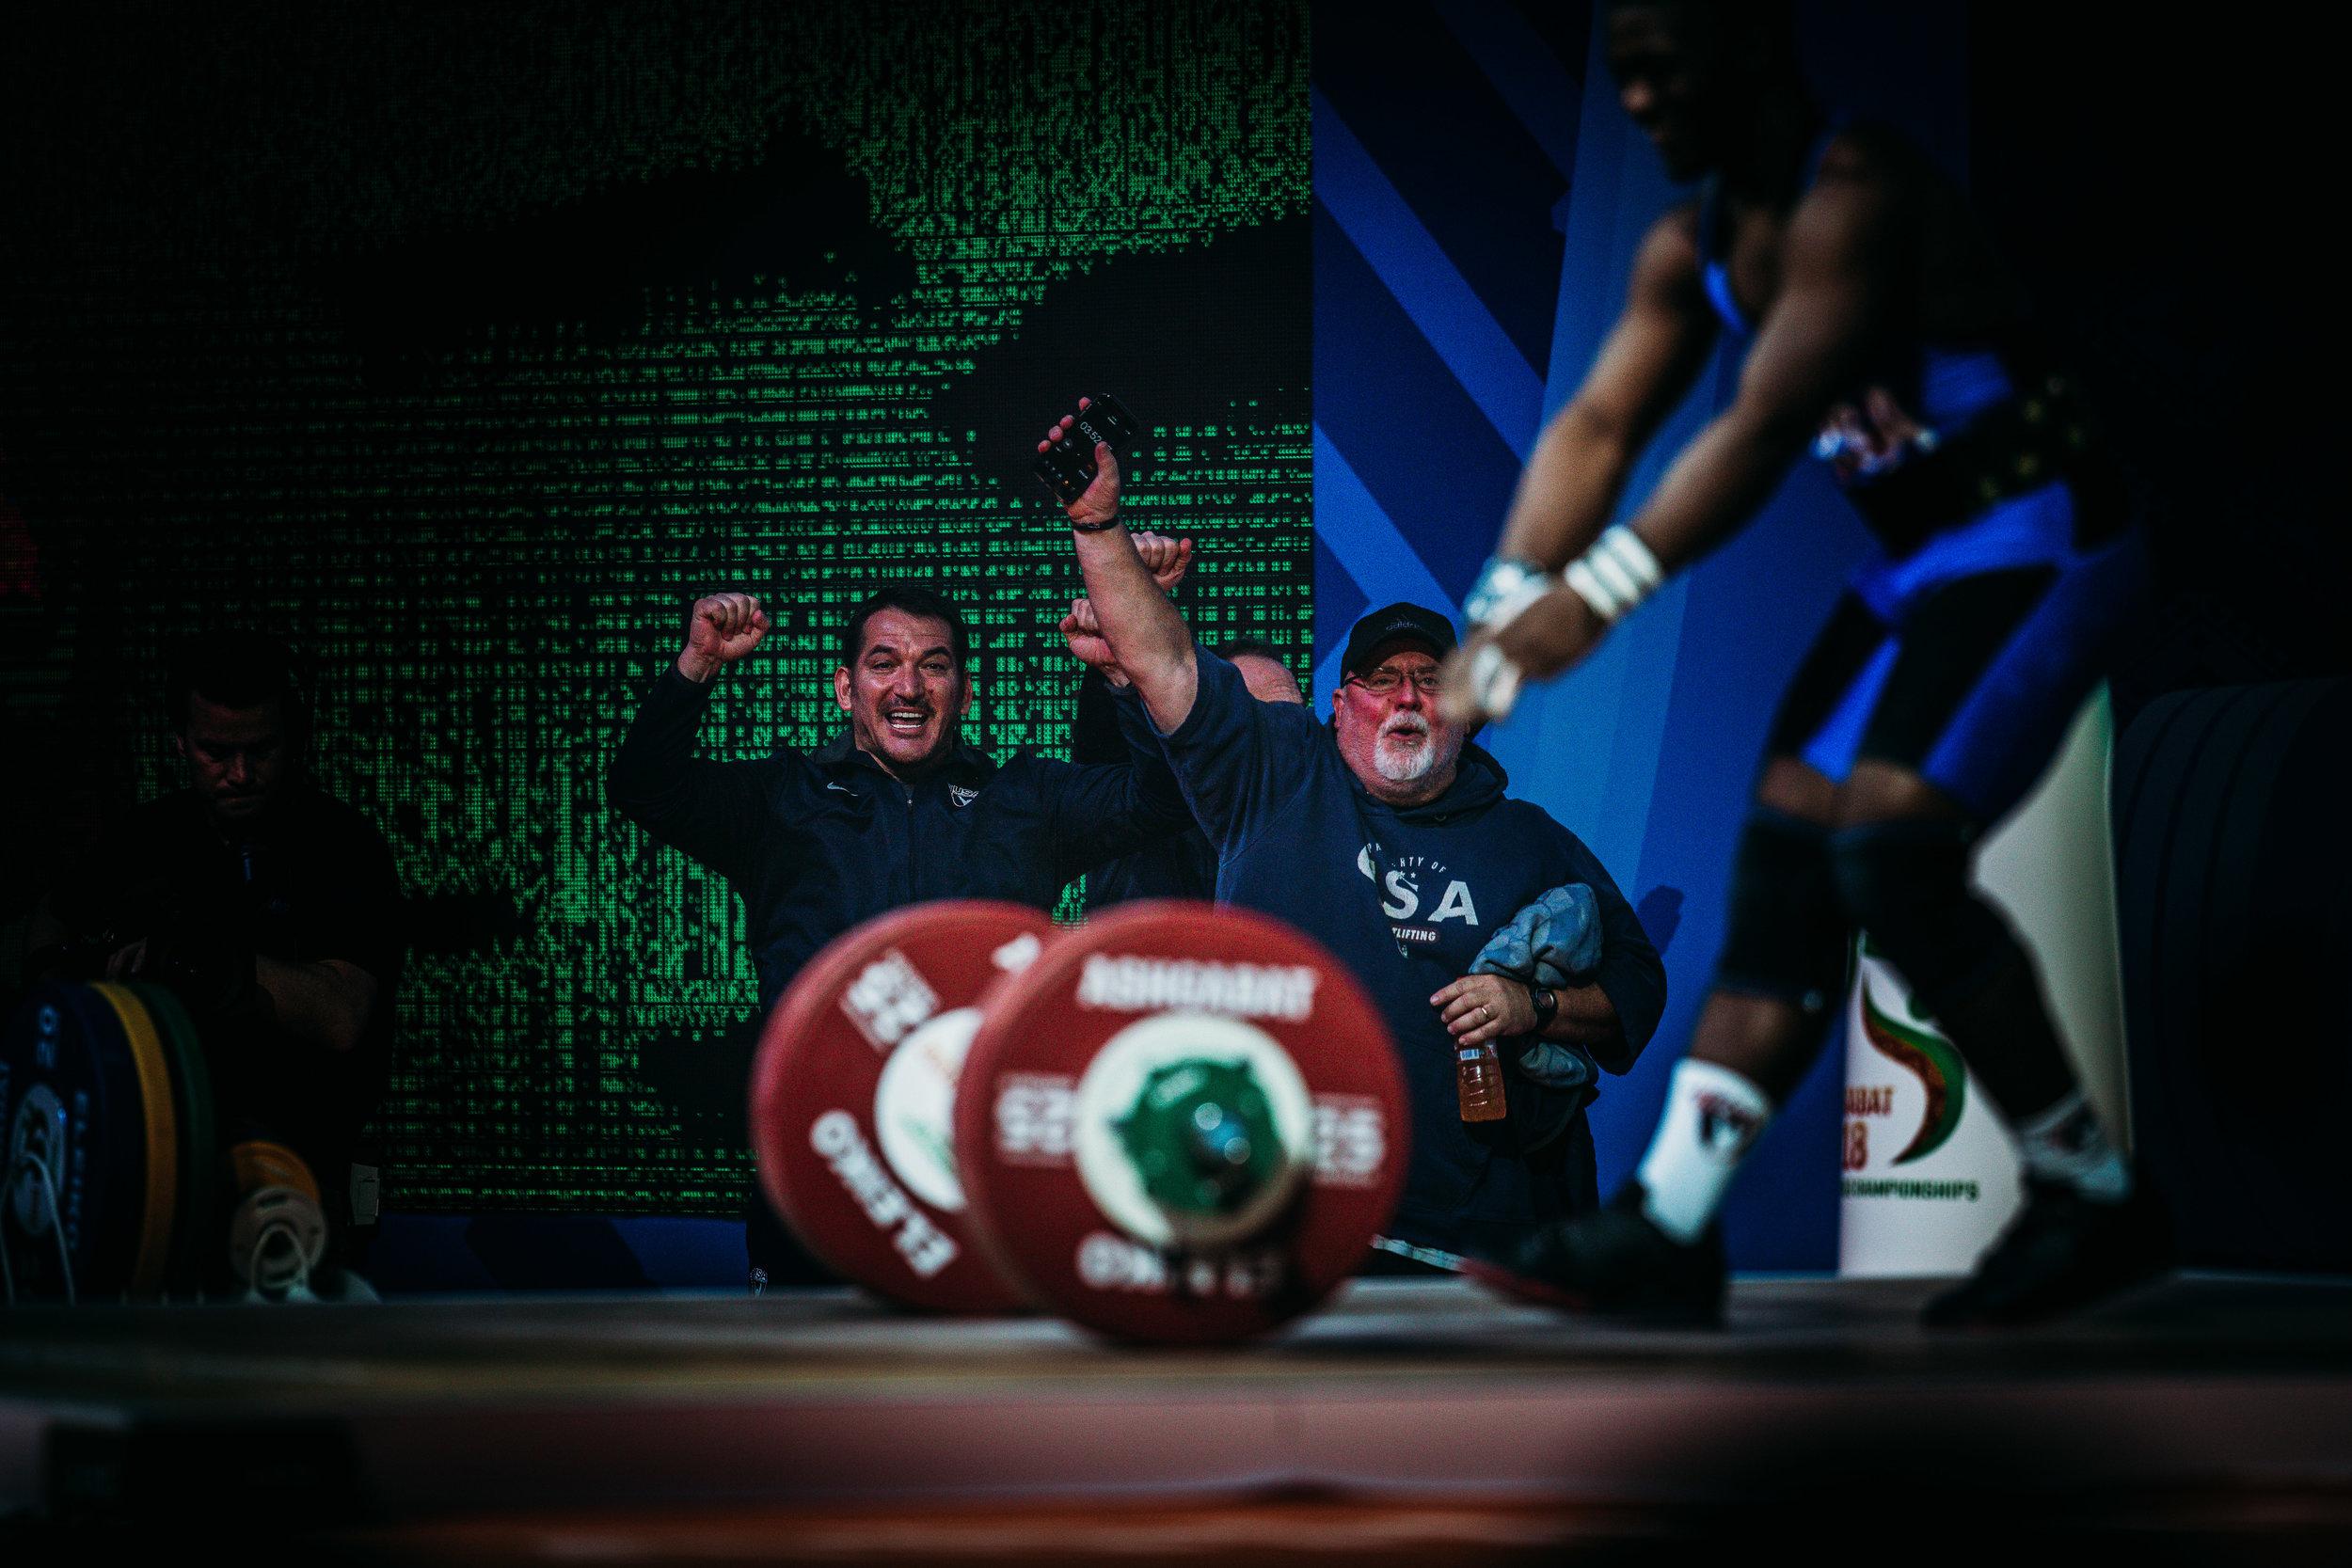 ashgabat-2018-world-weightlifting-championships-photos-by-viviana-podhaiski-weightlifting-photography-33.jpg